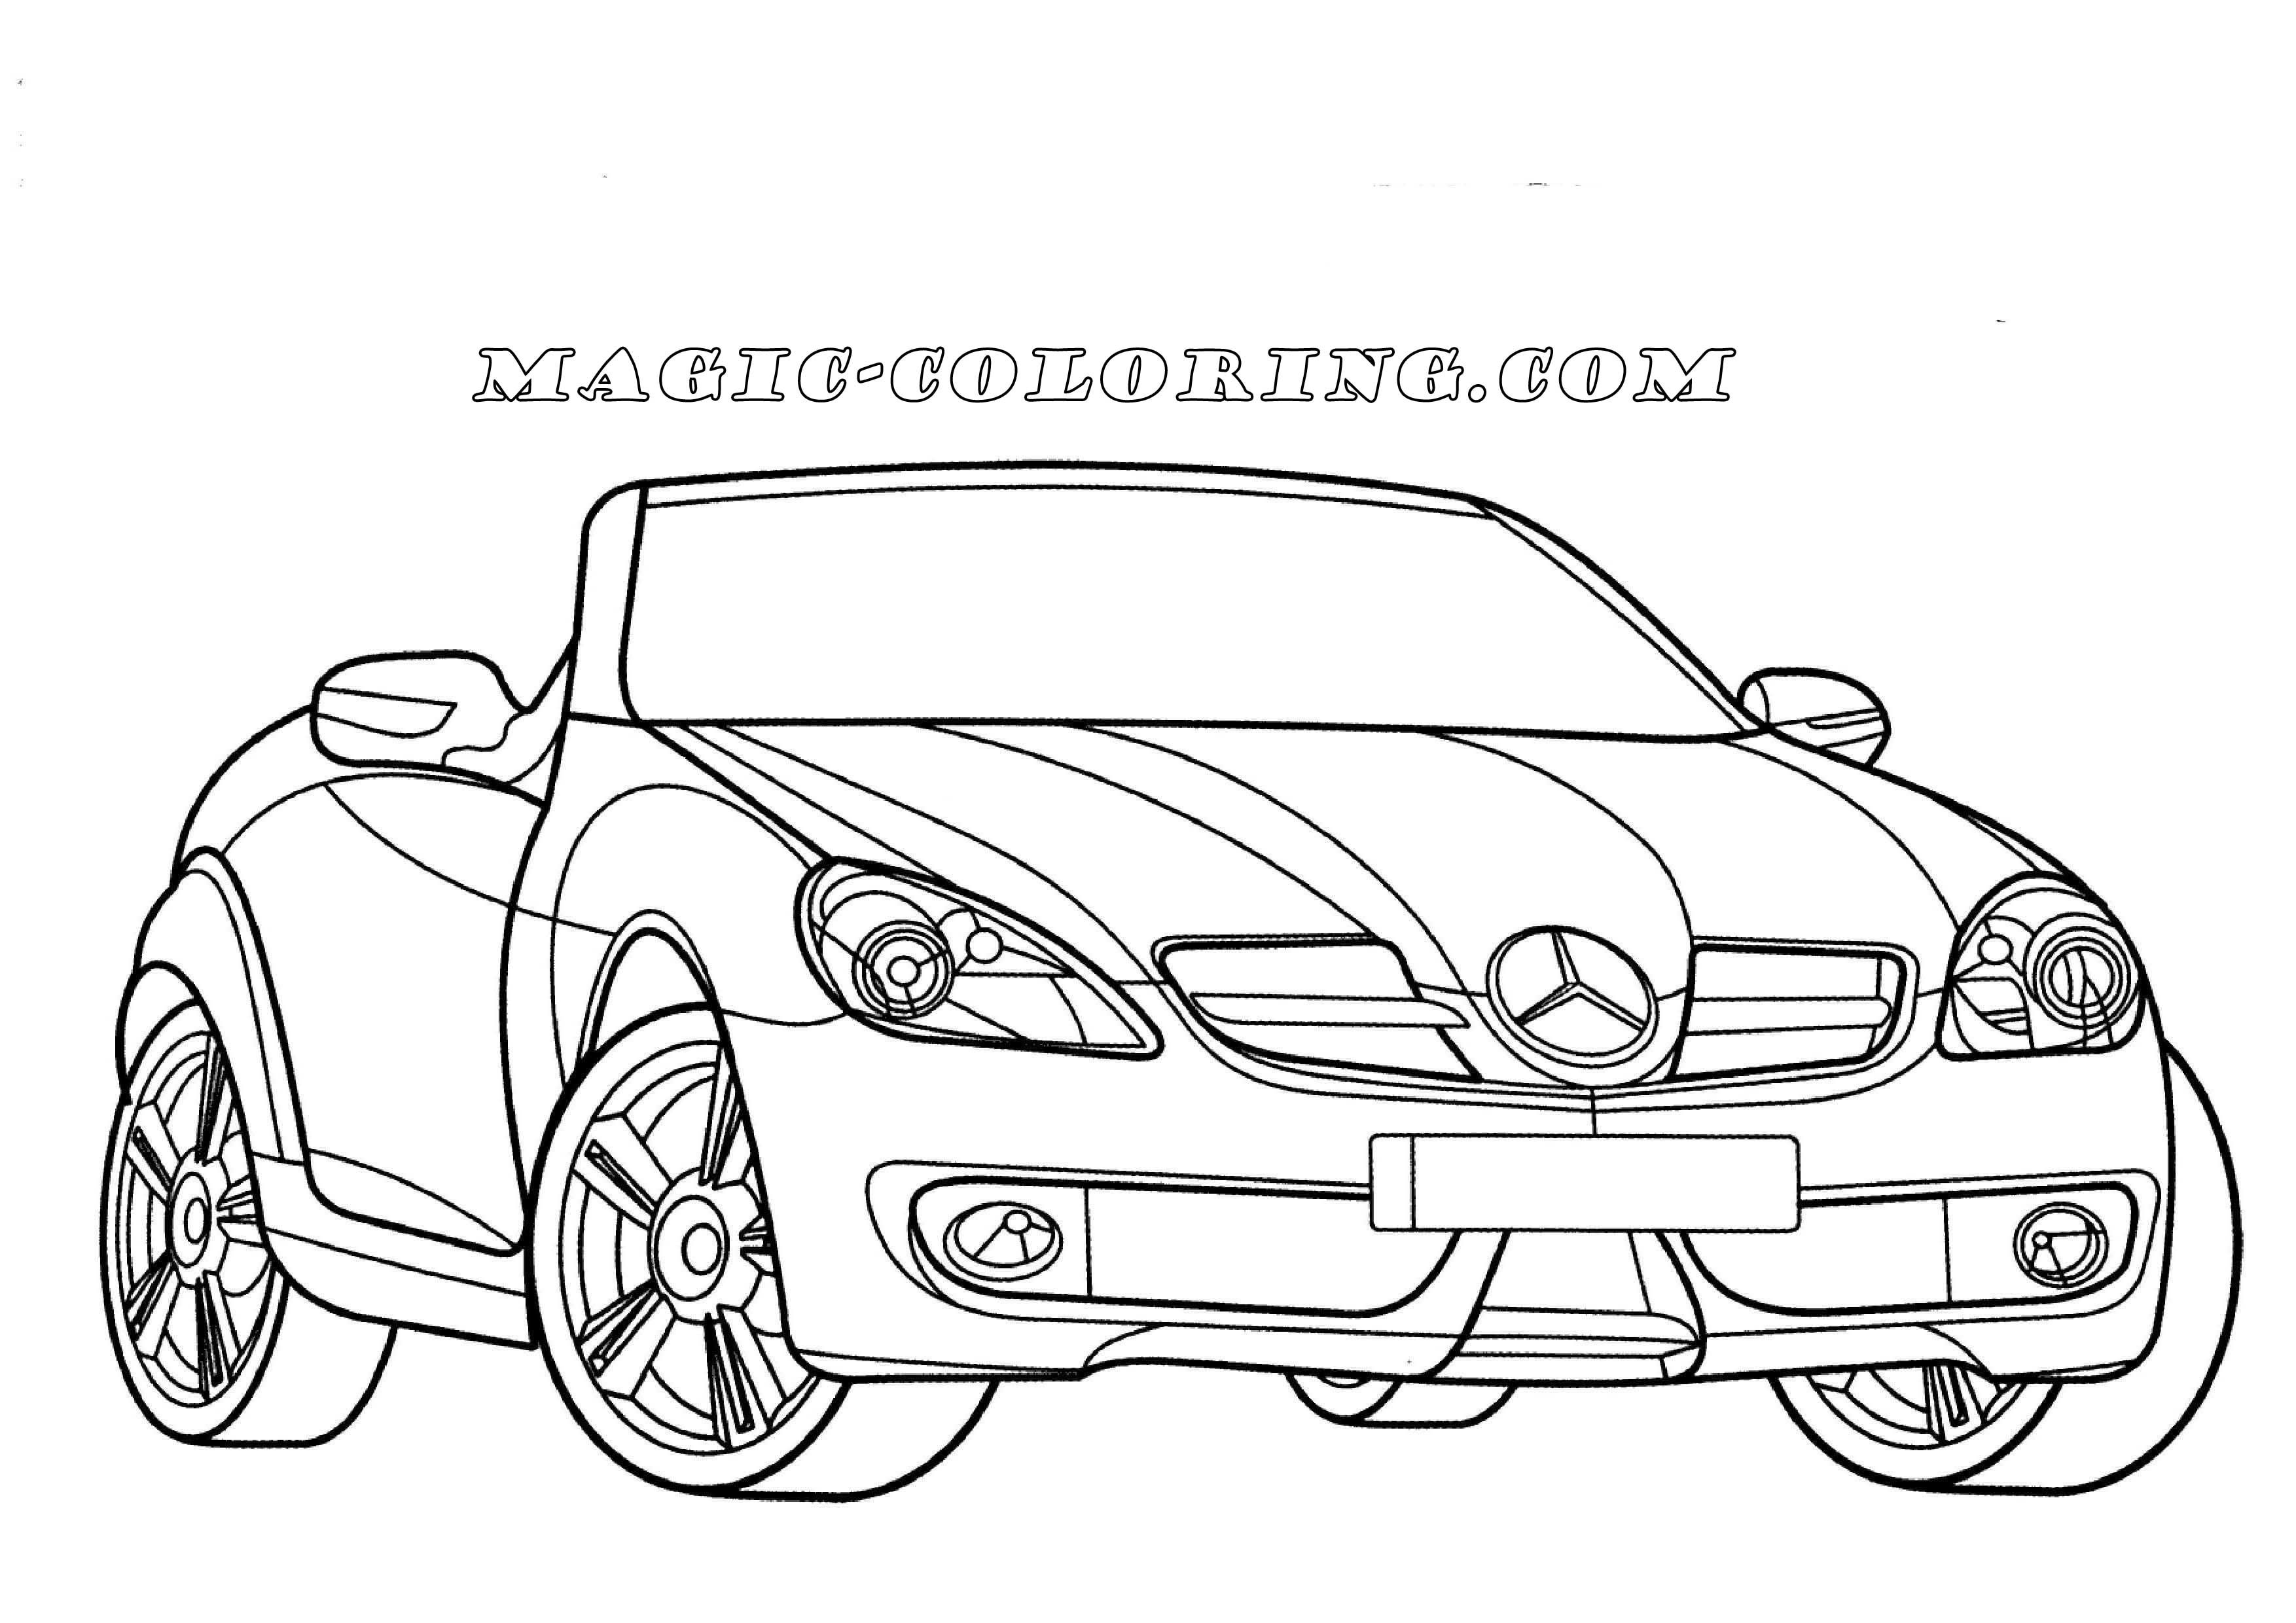 Mercedes Benz Slk Class Coloring Page Mercedes Benz Slk Mercedes Mercedes Slk